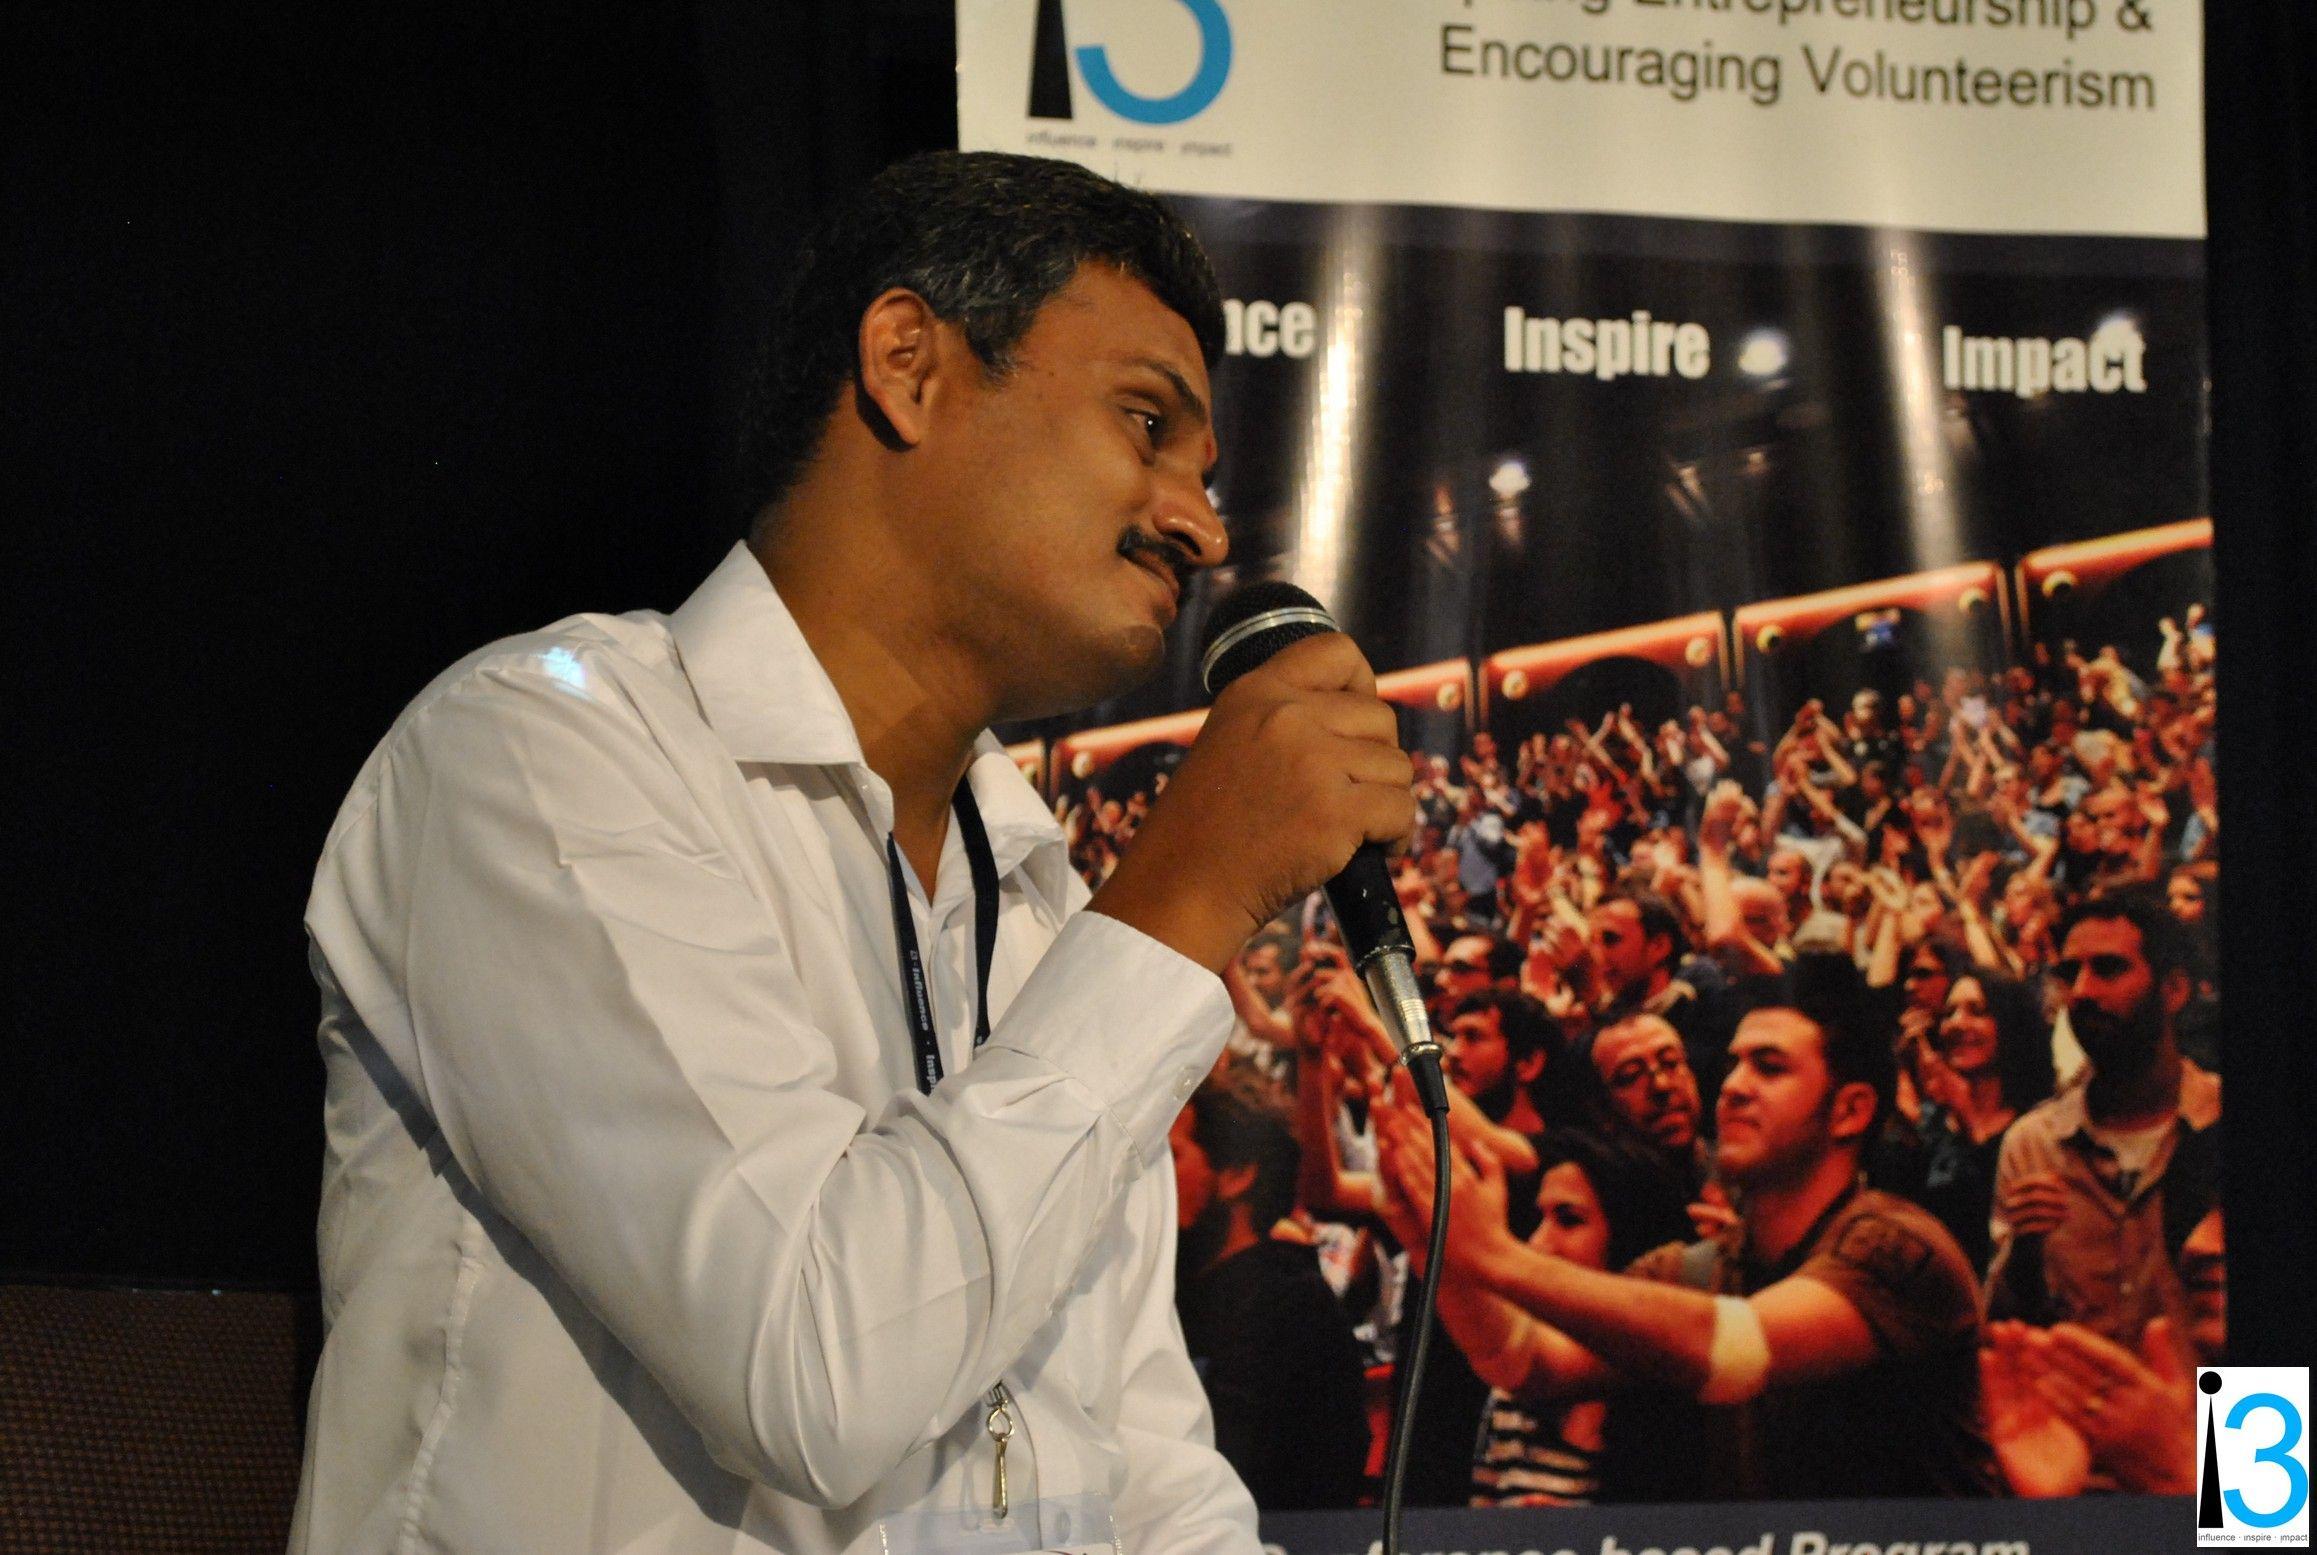 i3 Influence Inspire Impact | www.iuites.org